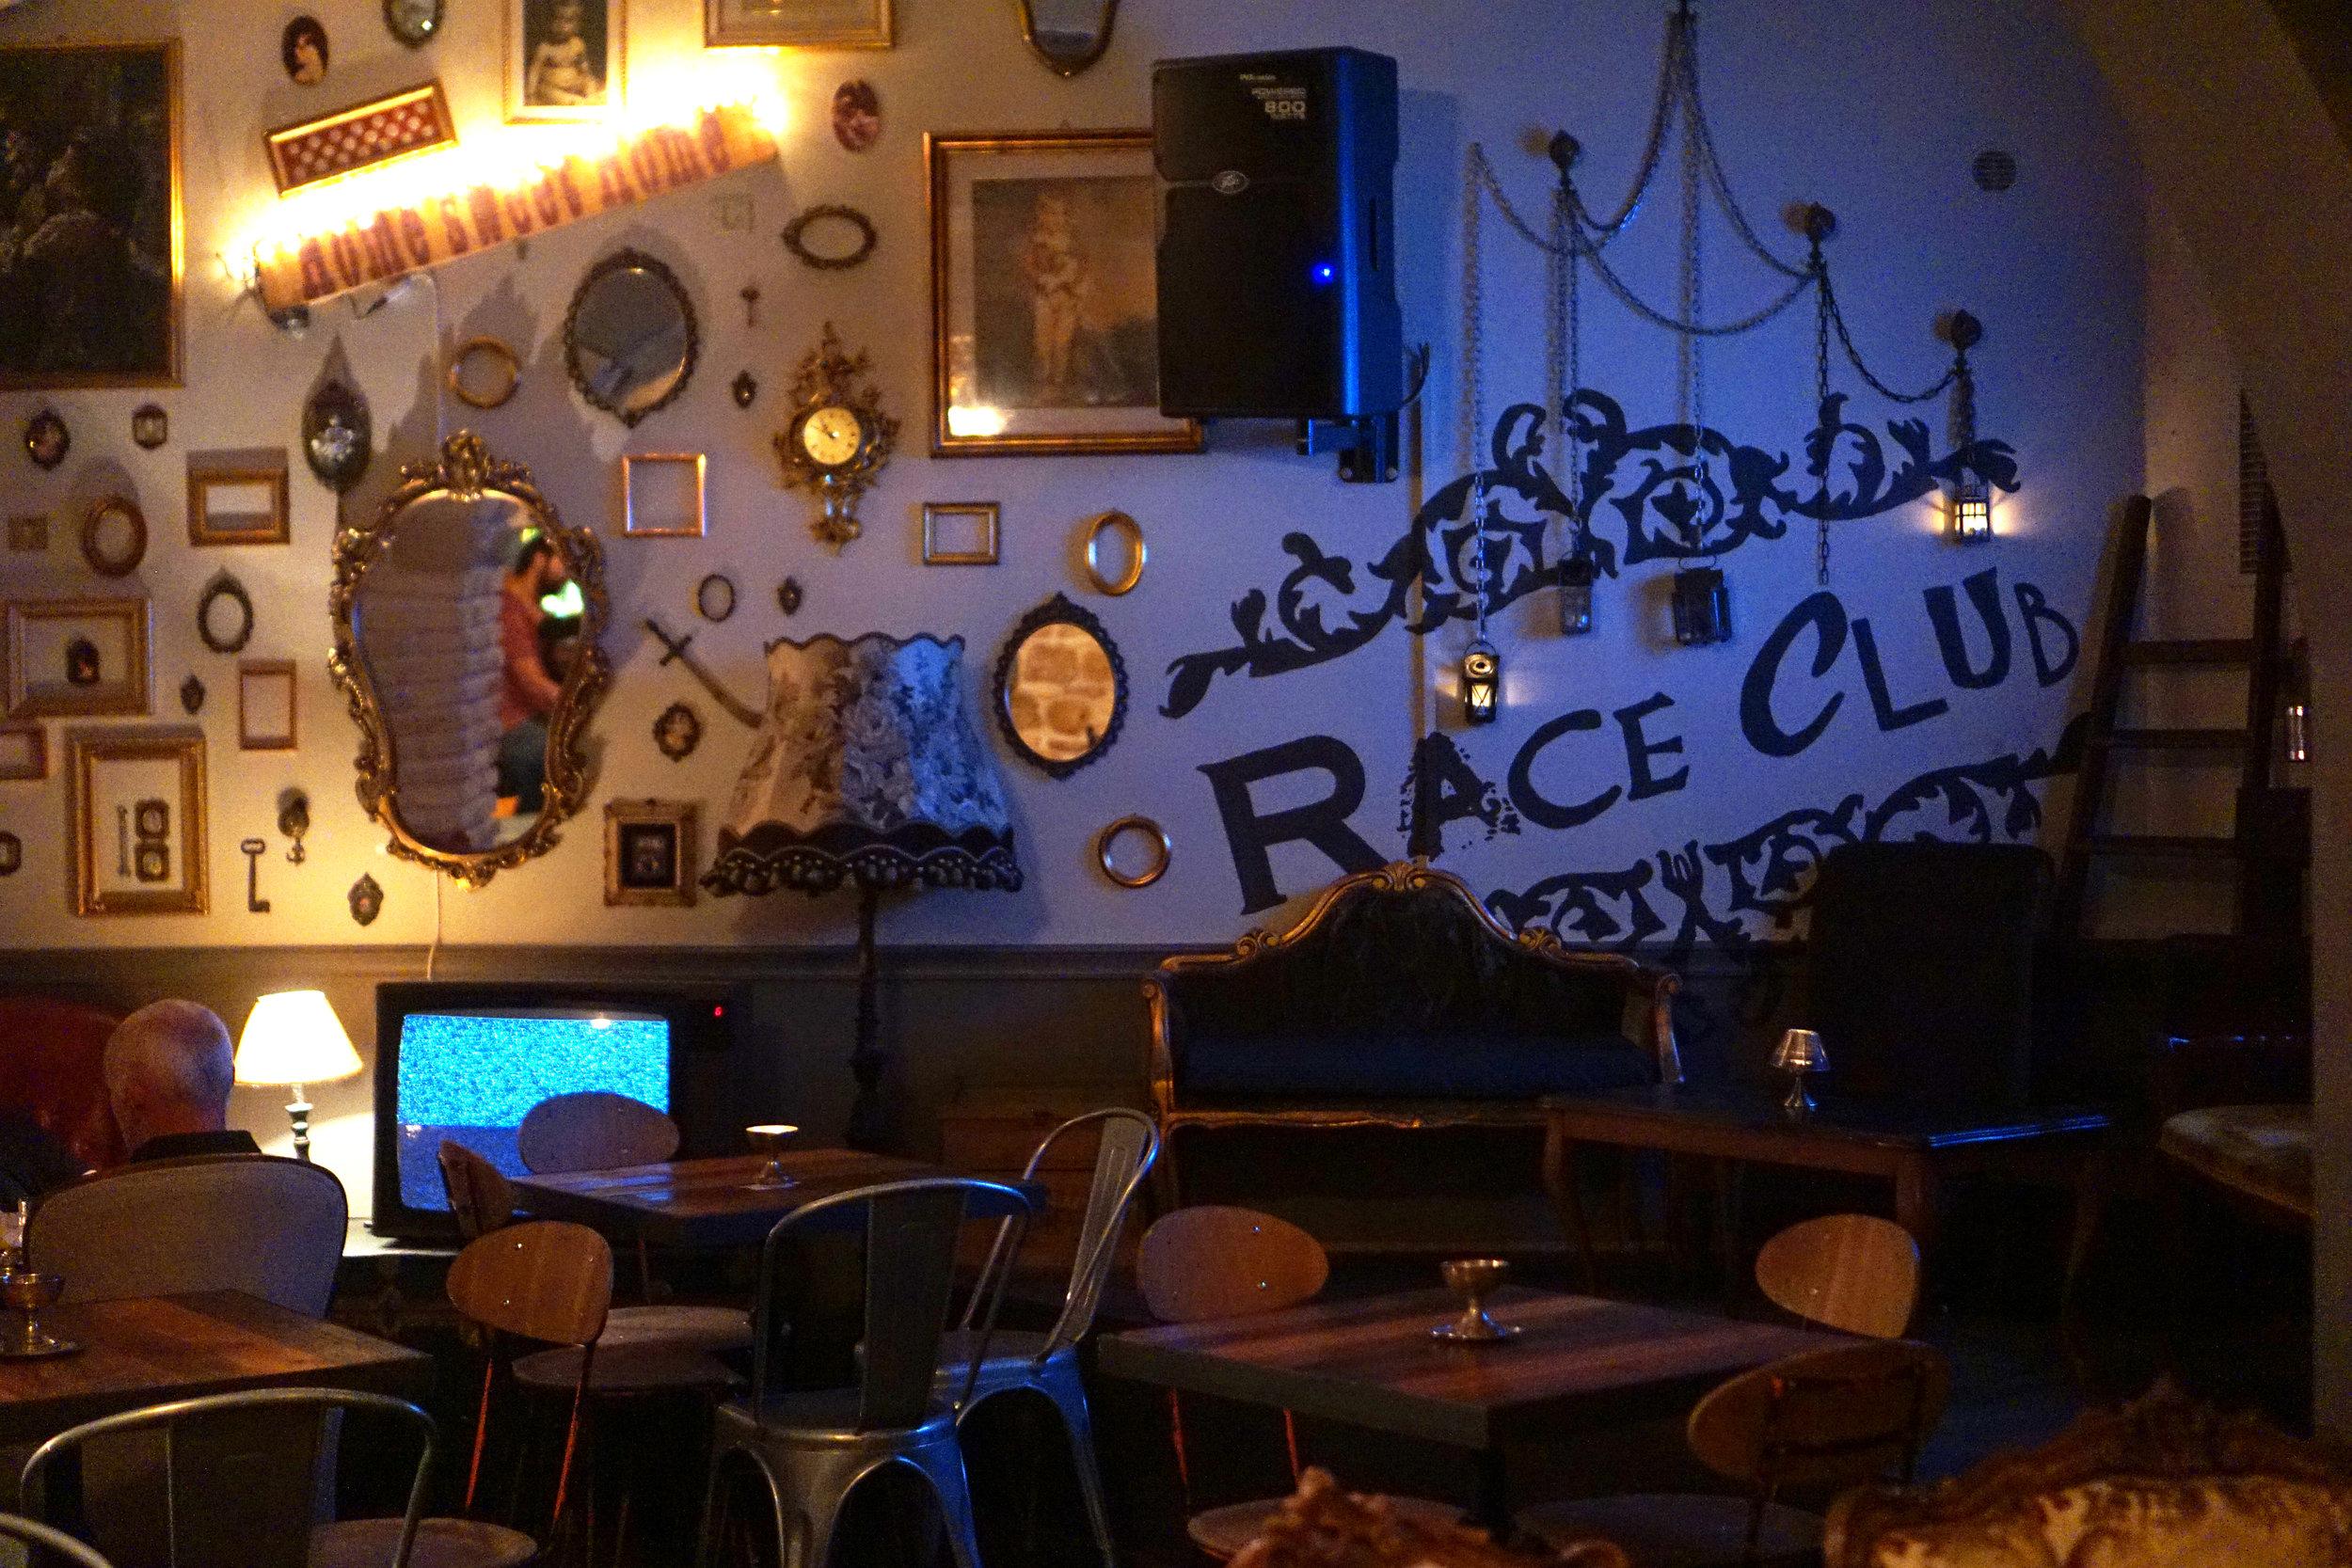 the-race-club-rome-02.jpg